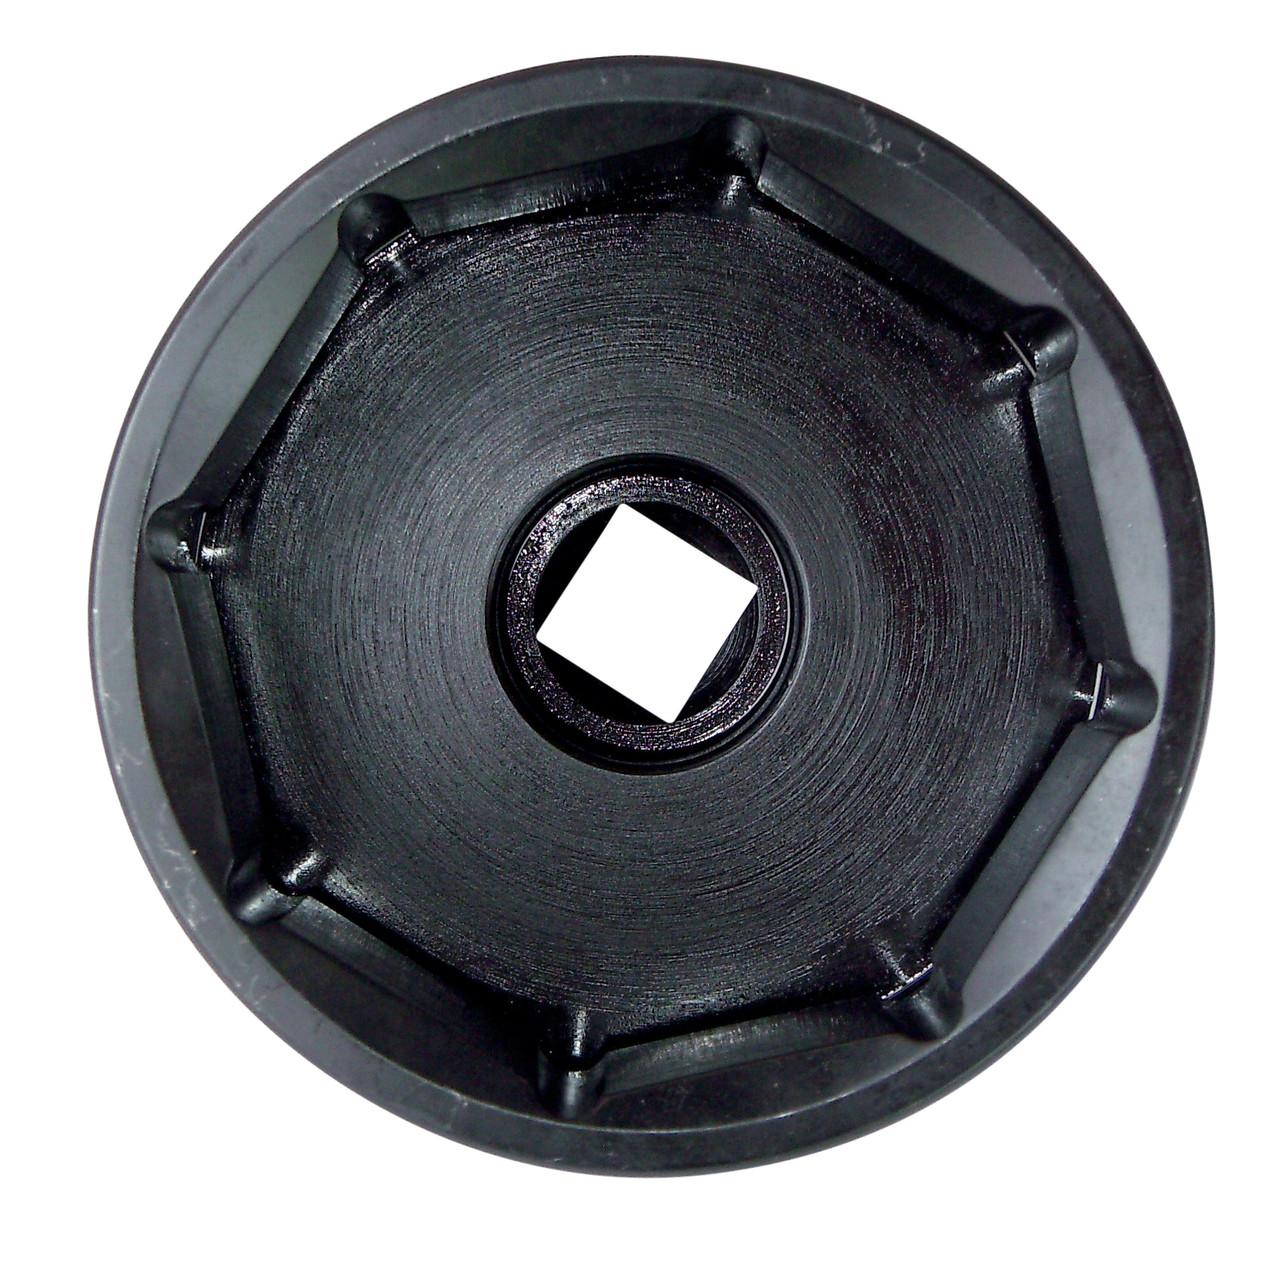 "Трансмісія і колеса, 3/4"" Ударний кругла головка, Bahco, BHVIS0895"